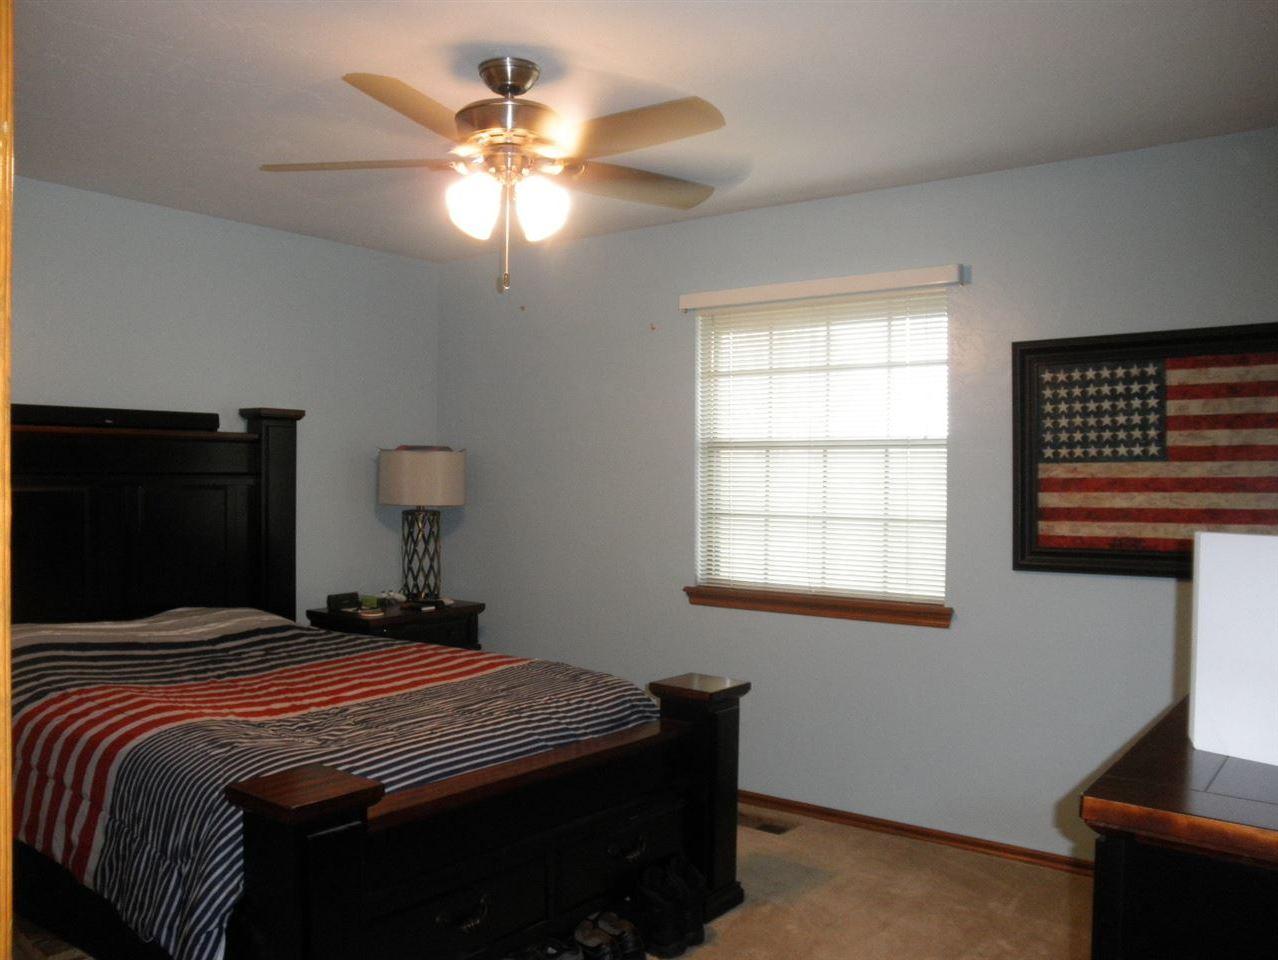 Sold Intraoffice W/MLS | 2800 Green Meadow Ponca City, OK 74604 22